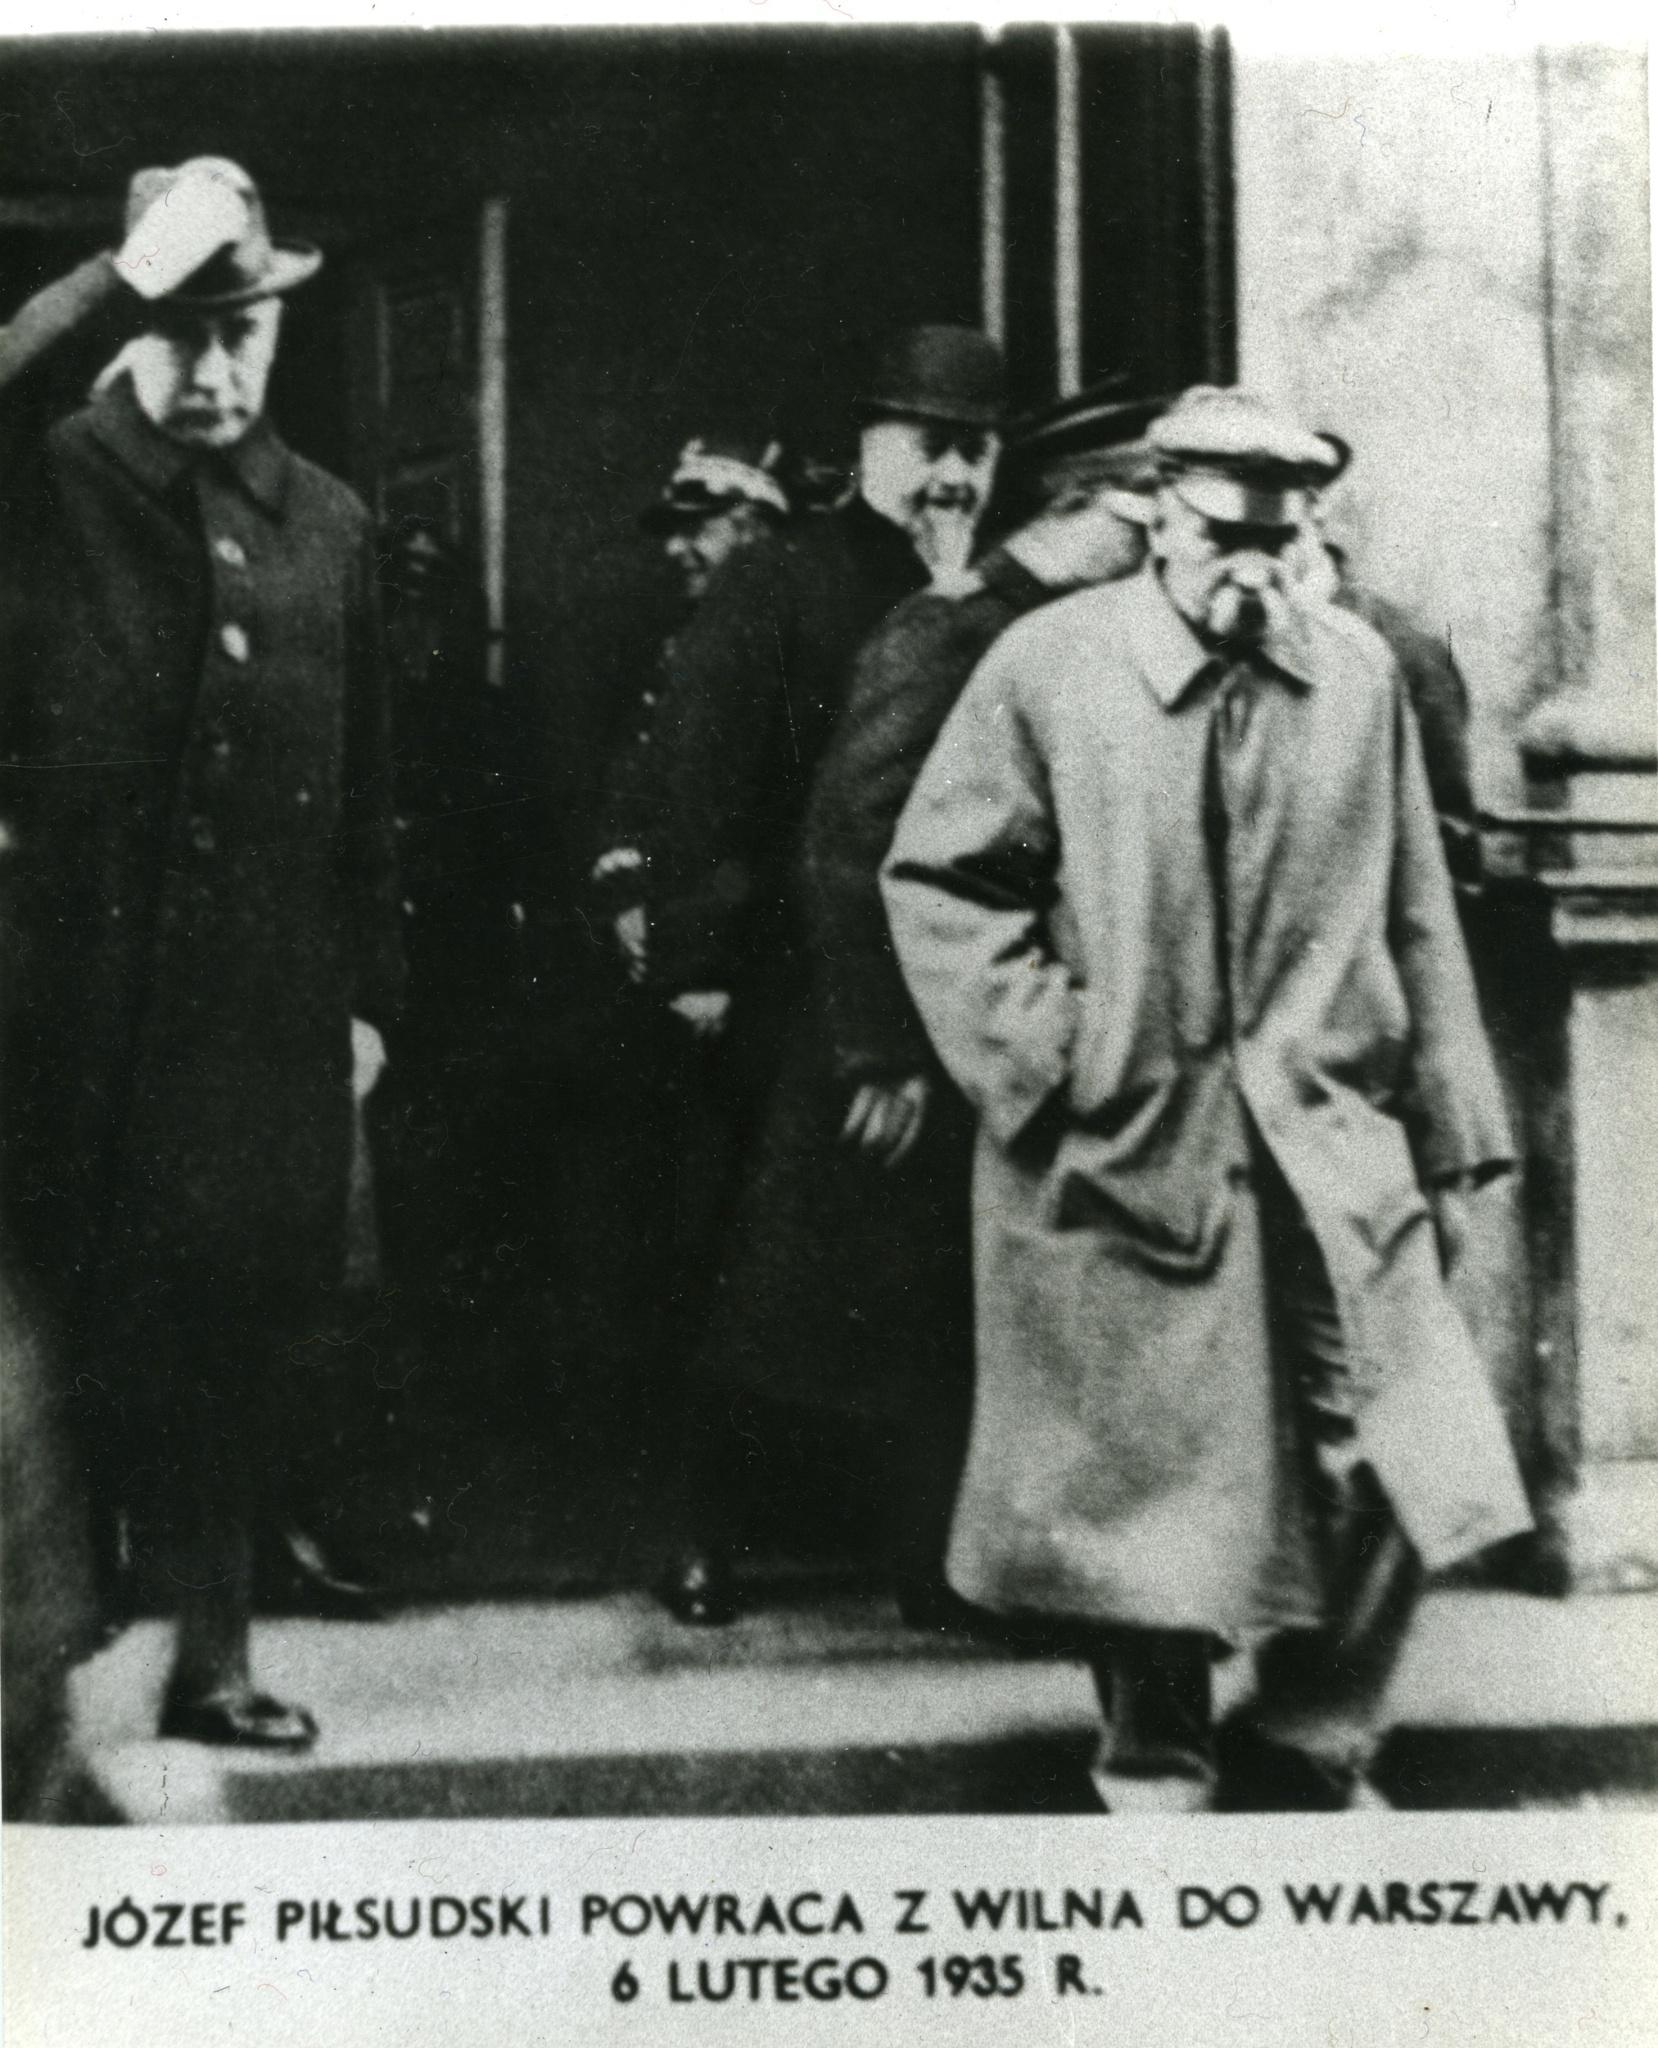 <div class='inner-box'><div class='close-desc'></div><span class='opis'>Józef Piłsudski wraca z Wilna do Warszawy.</span><div class='clearfix'></div><span>Cote du document FIL03174</span><div class='clearfix'></div><span>© Instytut Literacki</span></div>